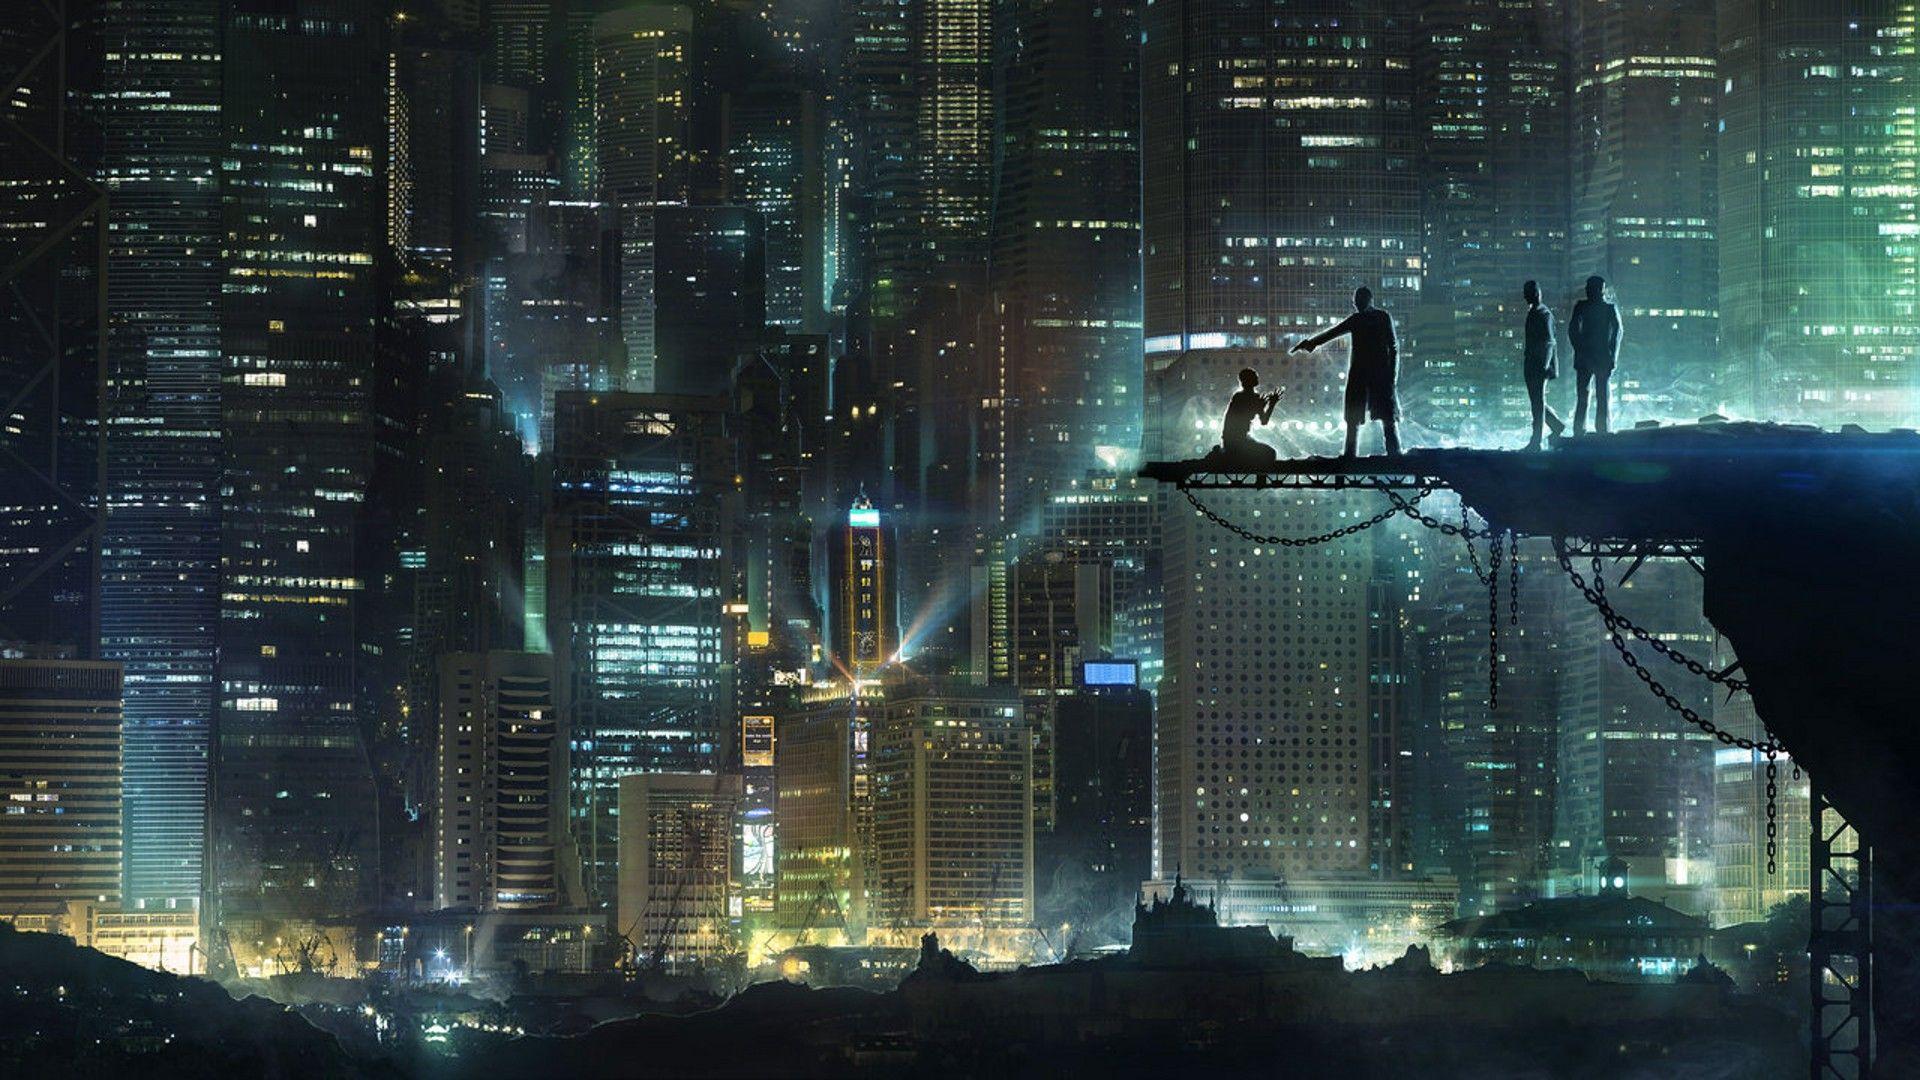 cyberpunk cityscape wallpaper